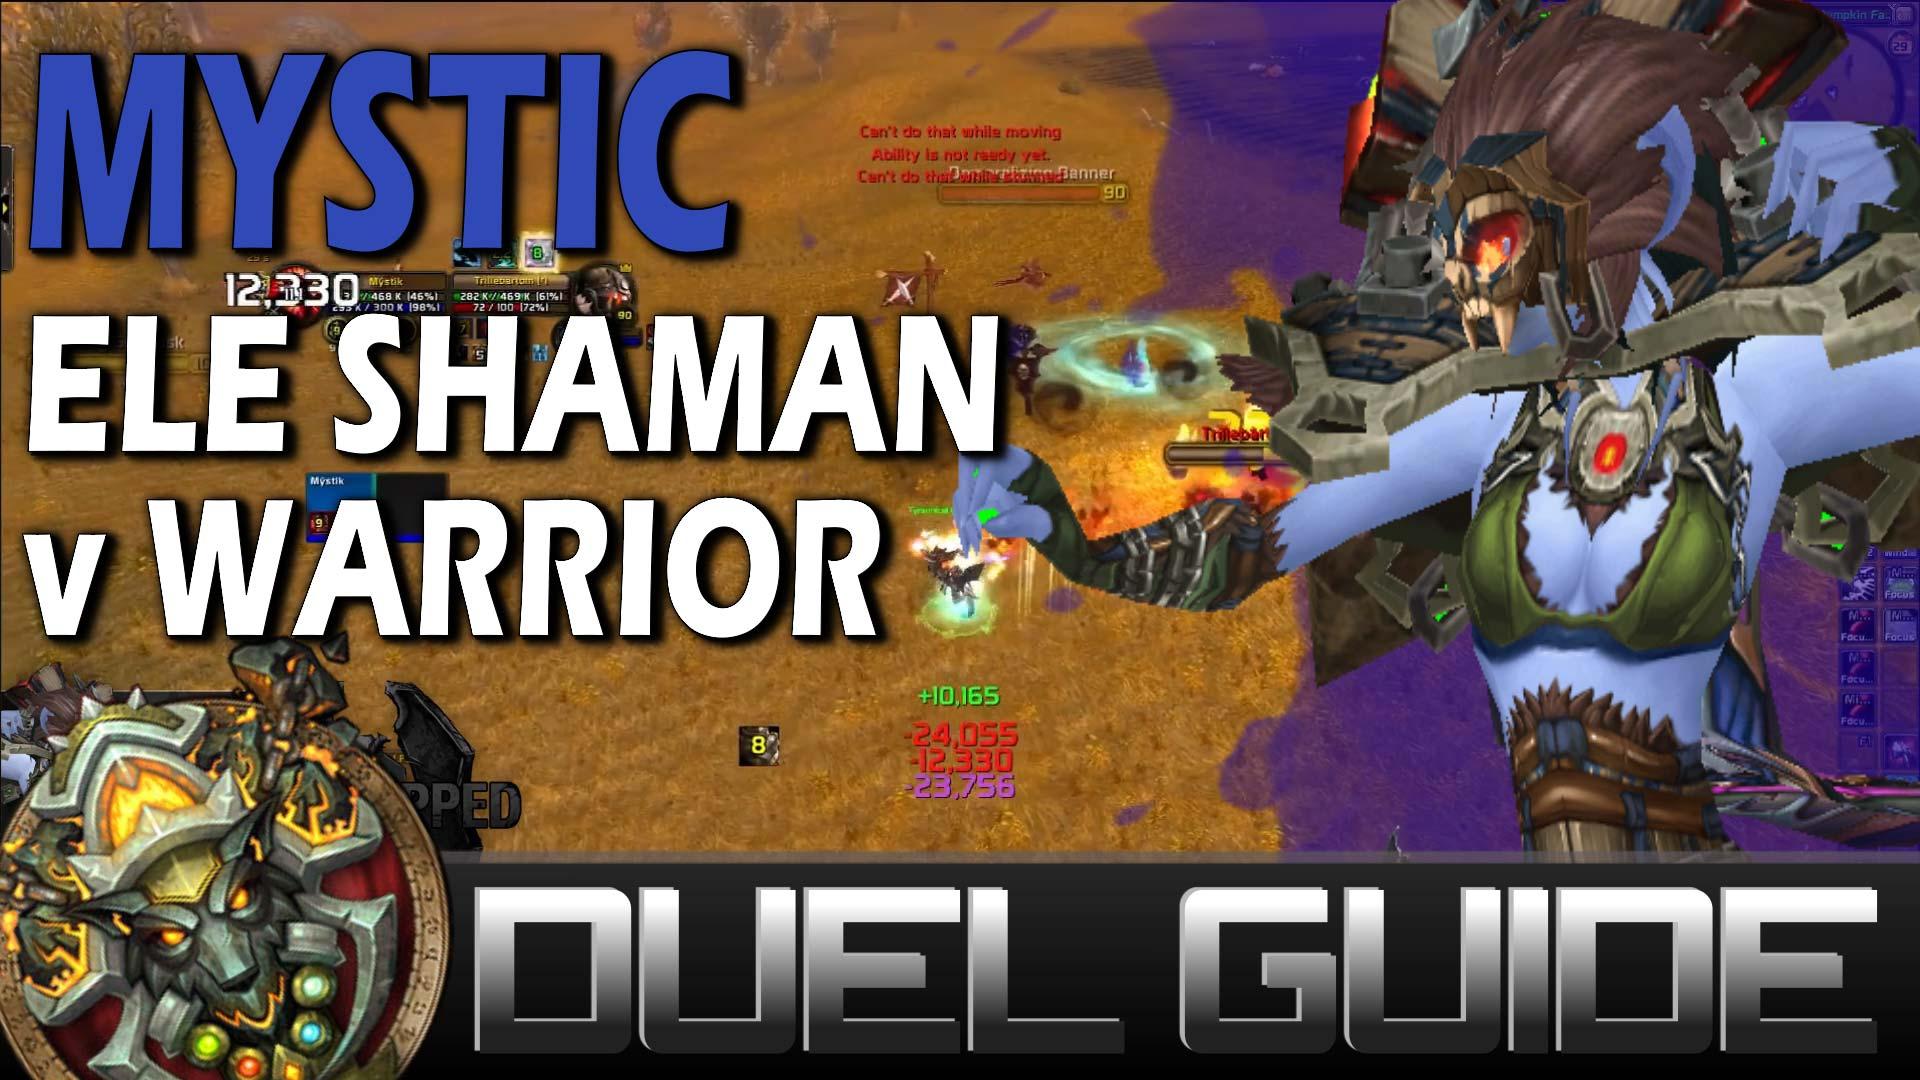 Mystic - Elemental Shaman v Warrior Duel Guide - Skill Capped